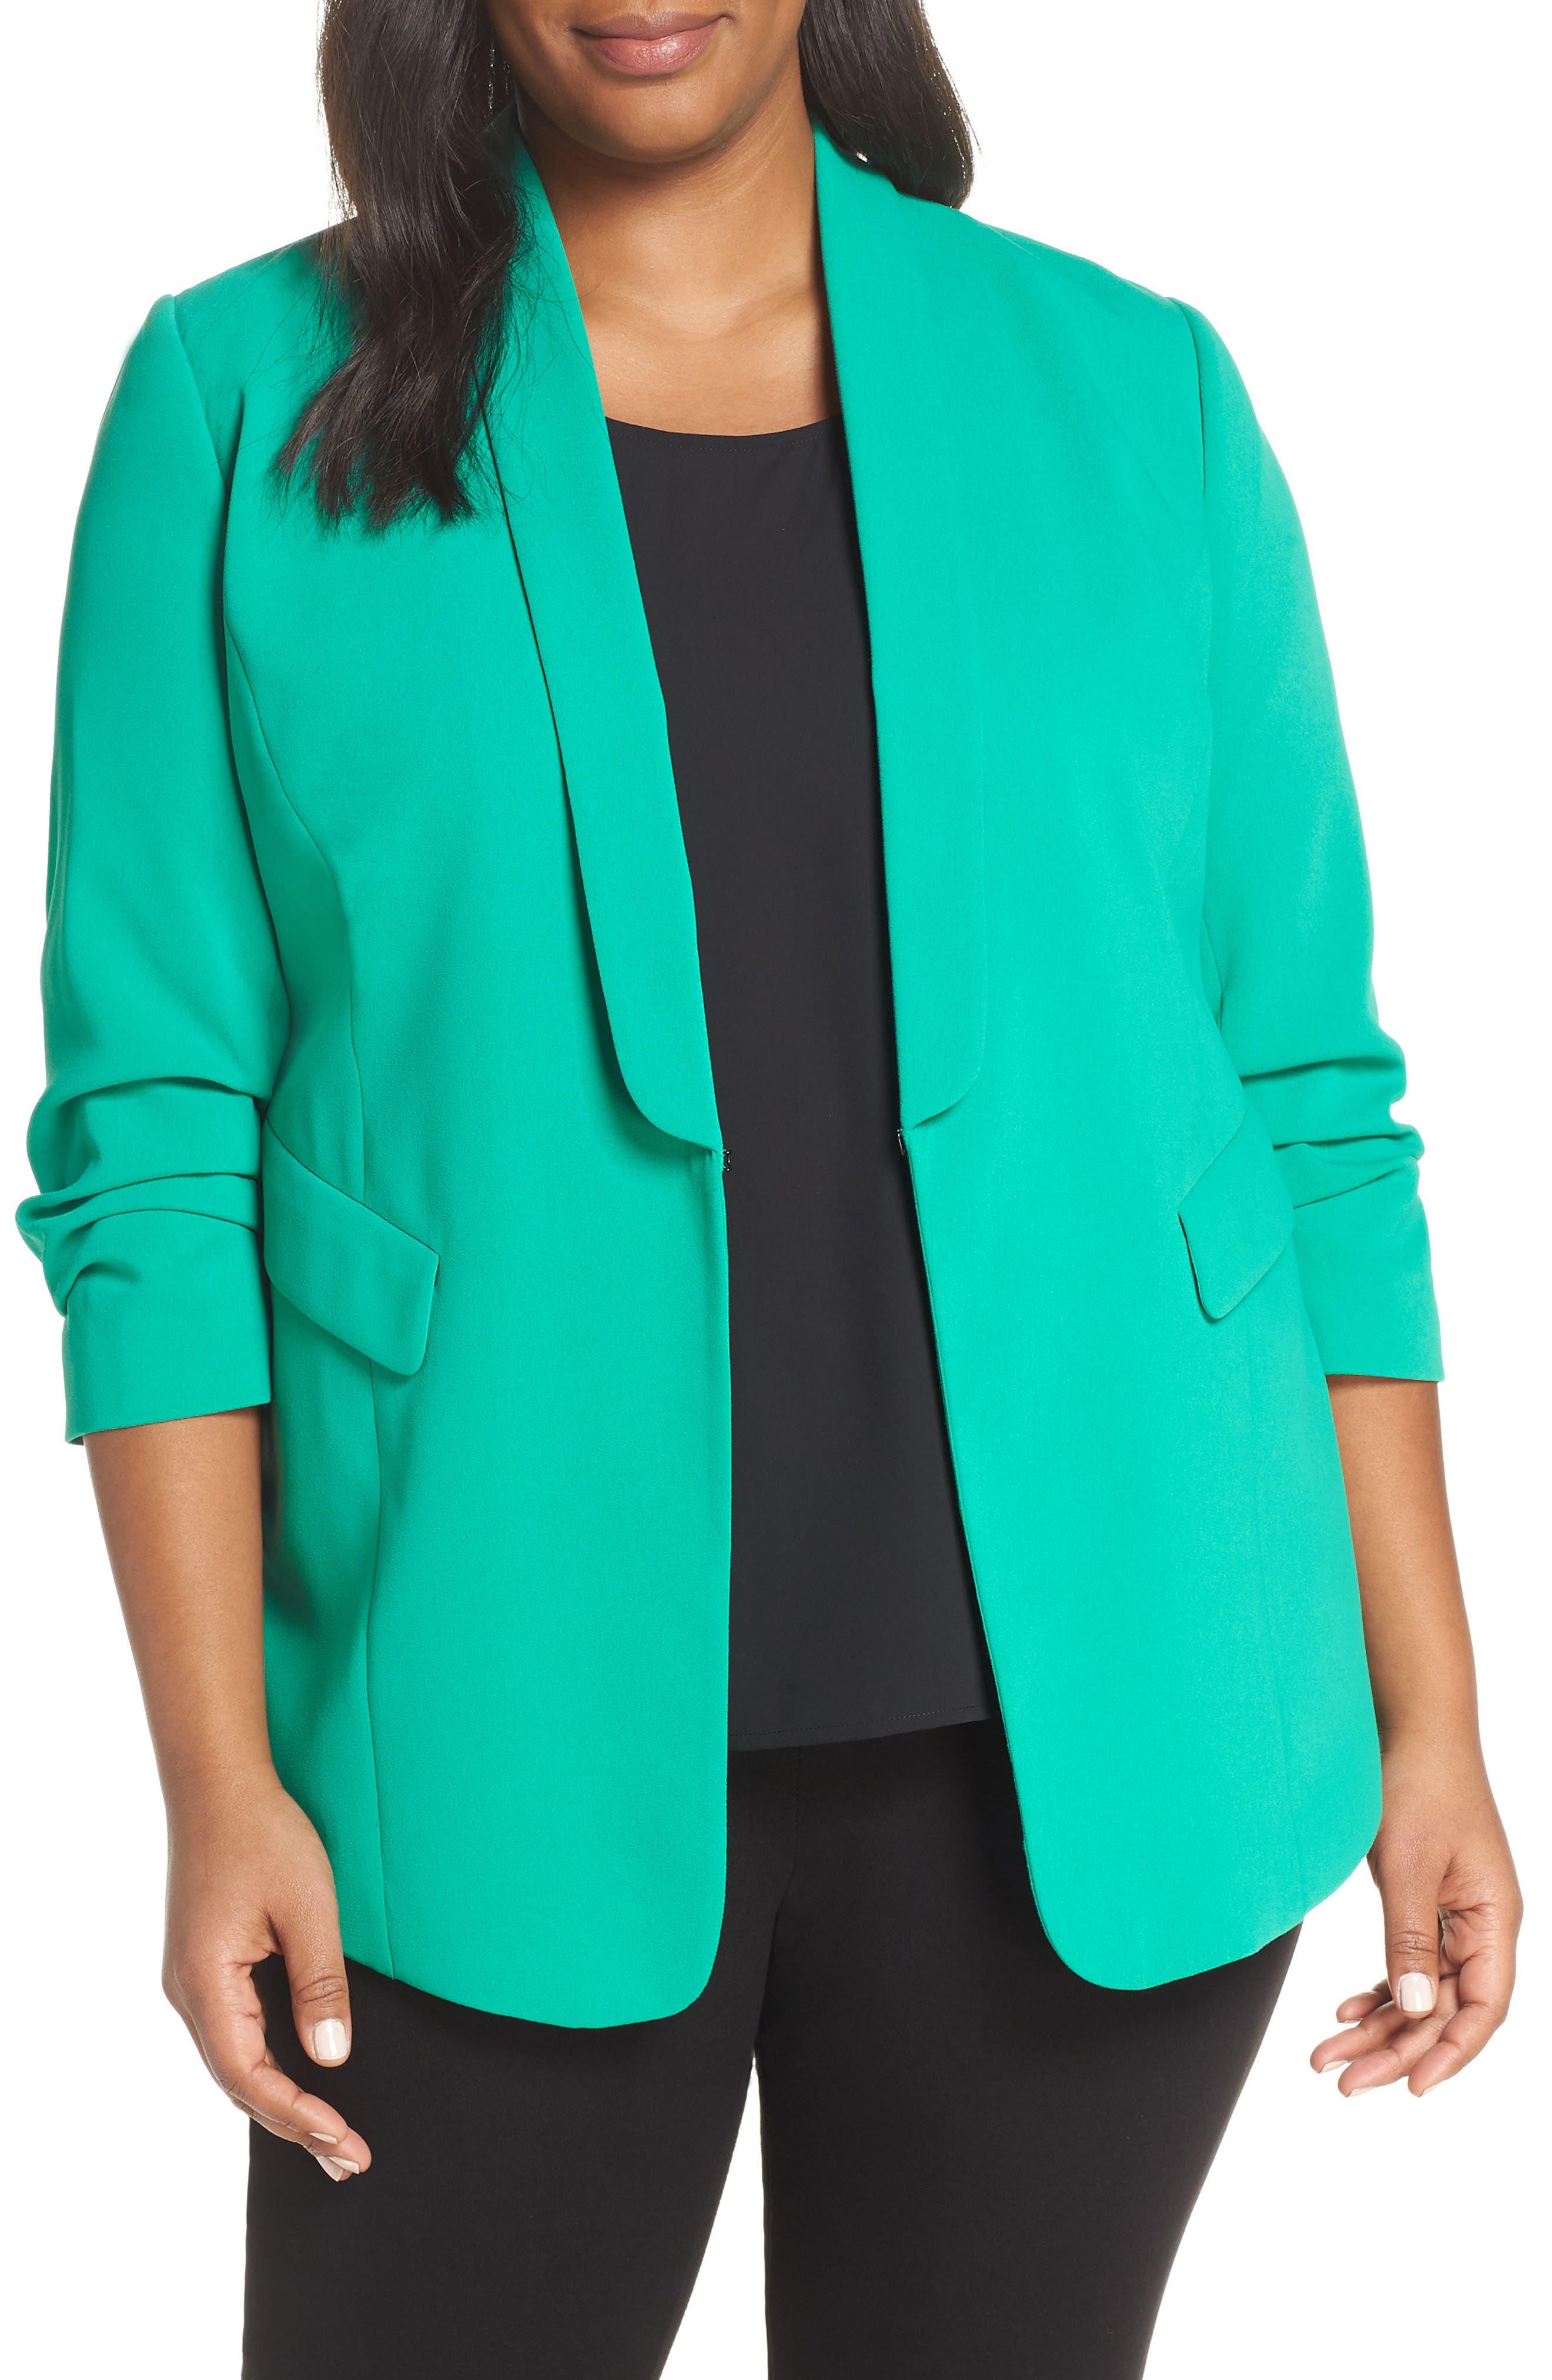 SEJOUR, Gathered Sleeve Blazer, Main thumbnail 1, color, GREEN PARAKEET